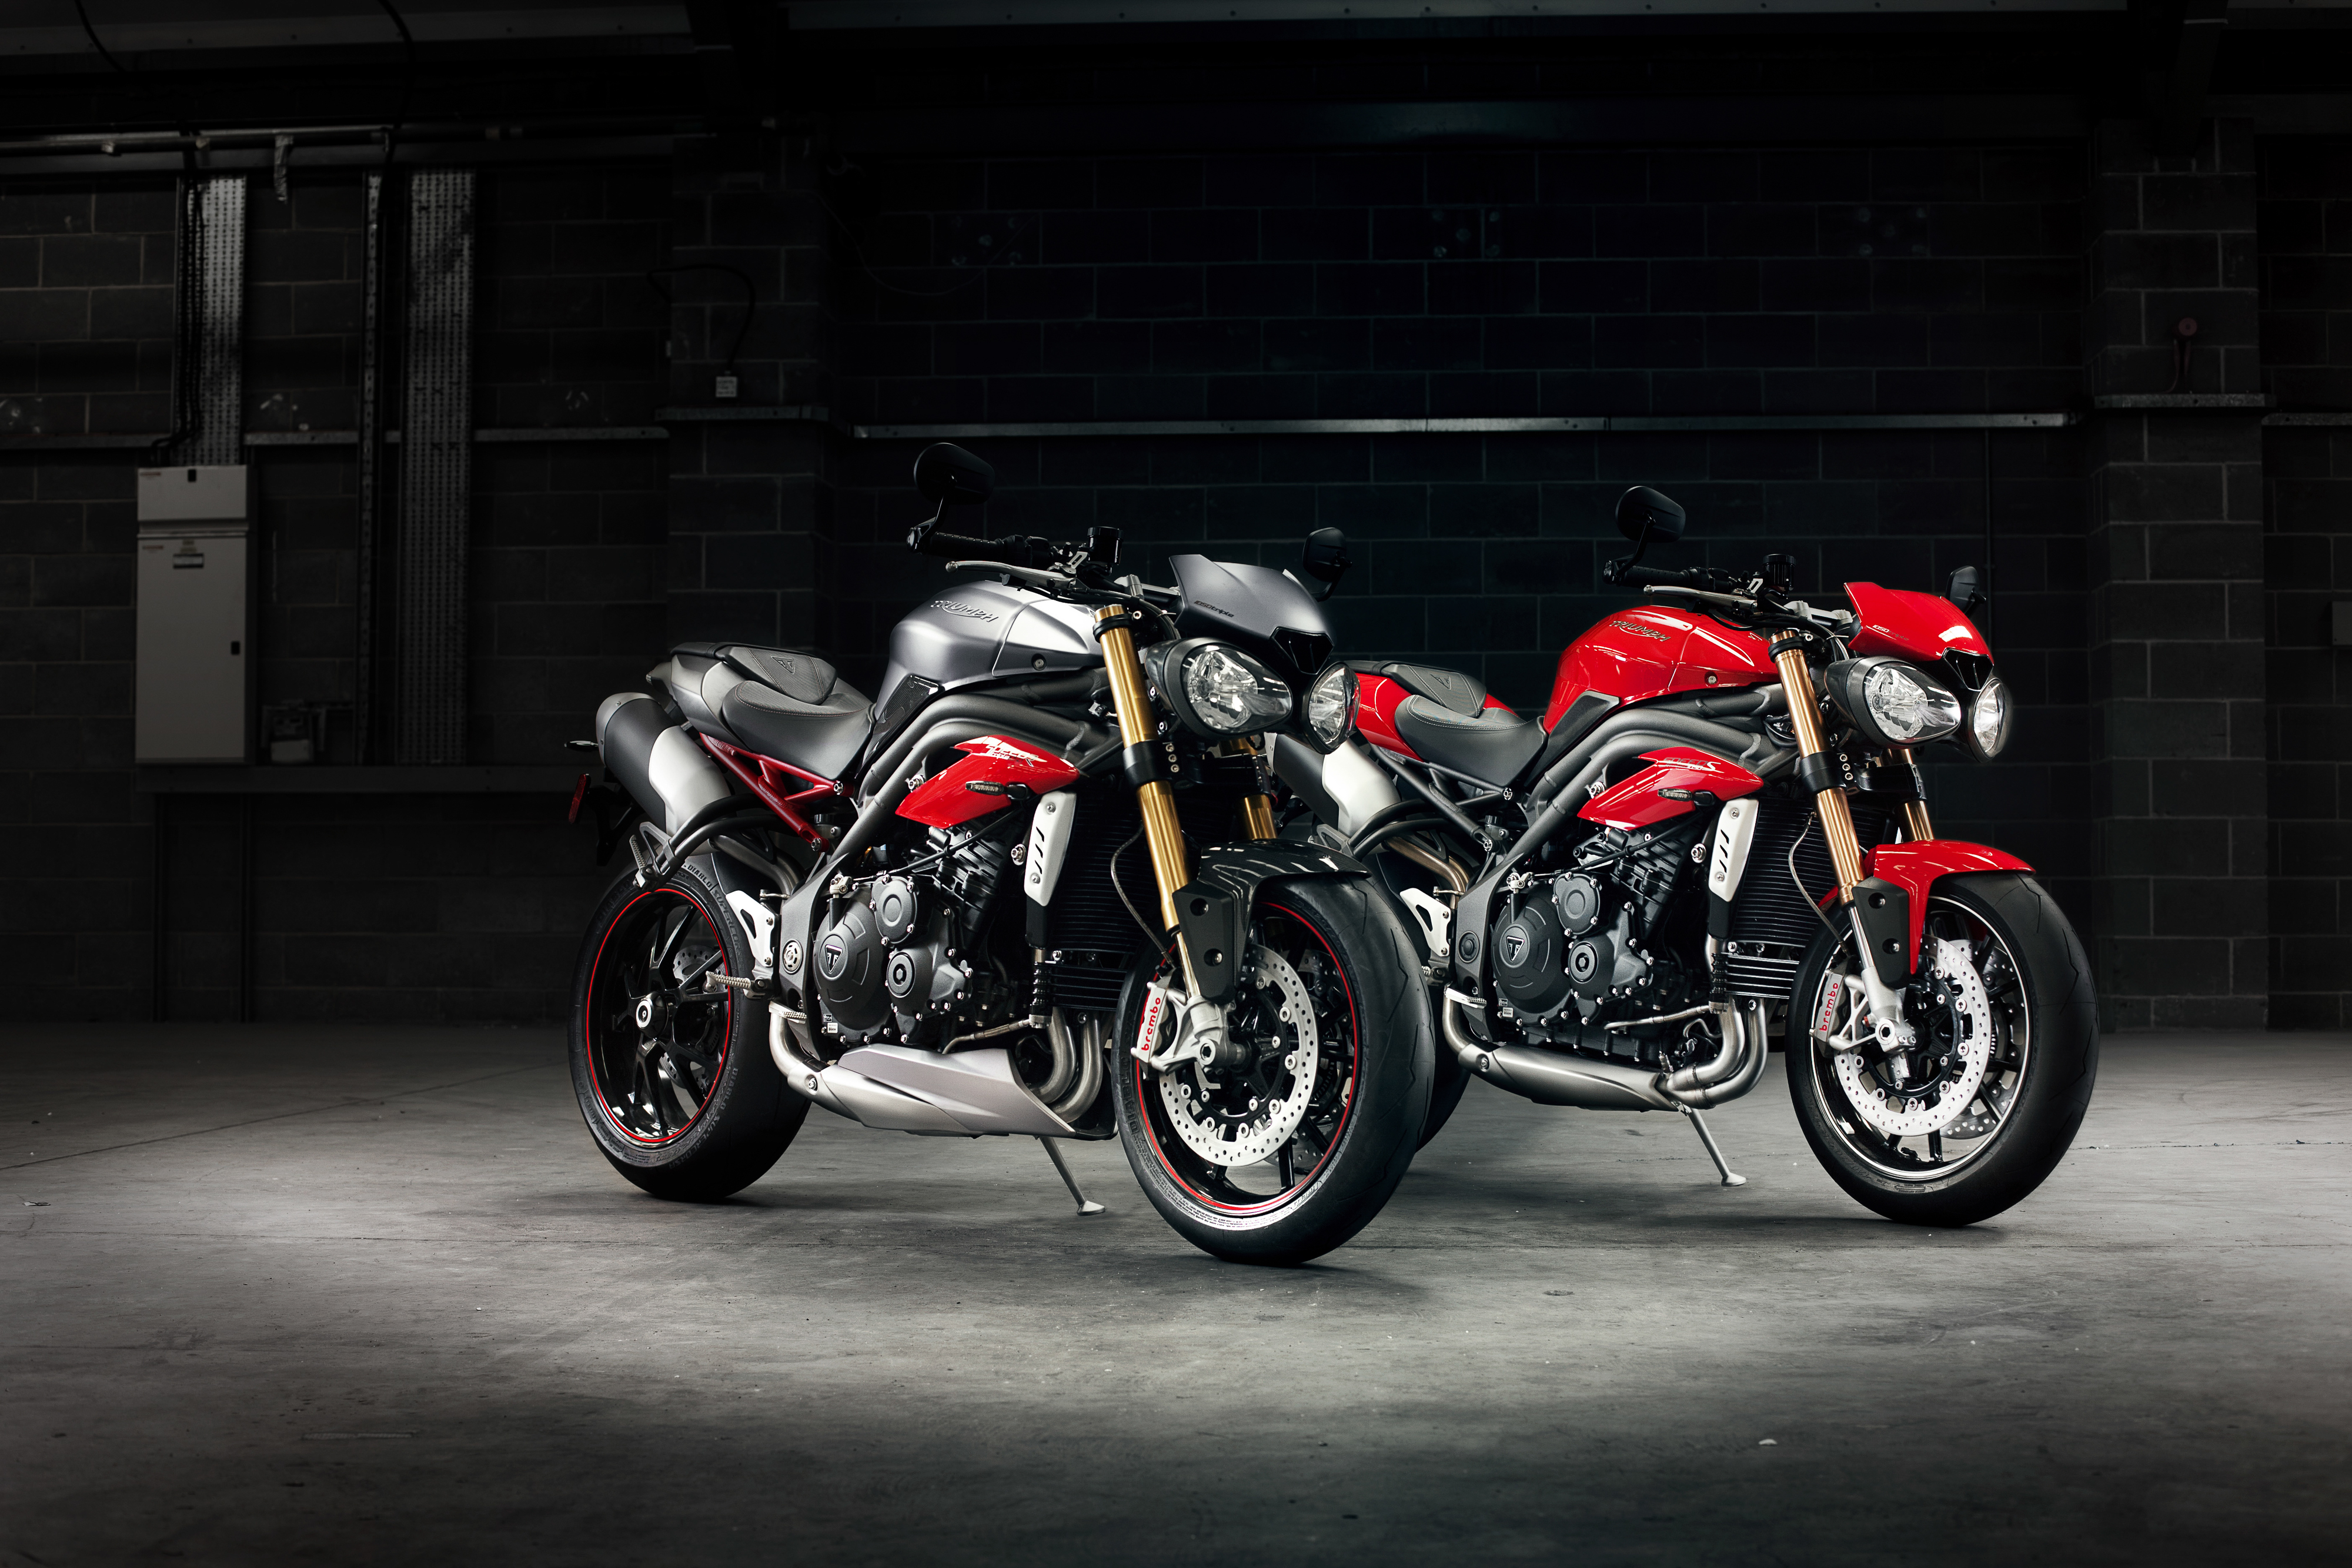 Honda Cruiser Models >> NEW 2016 TRIUMPH SPEED TRIPLE MODELS - Bike Review